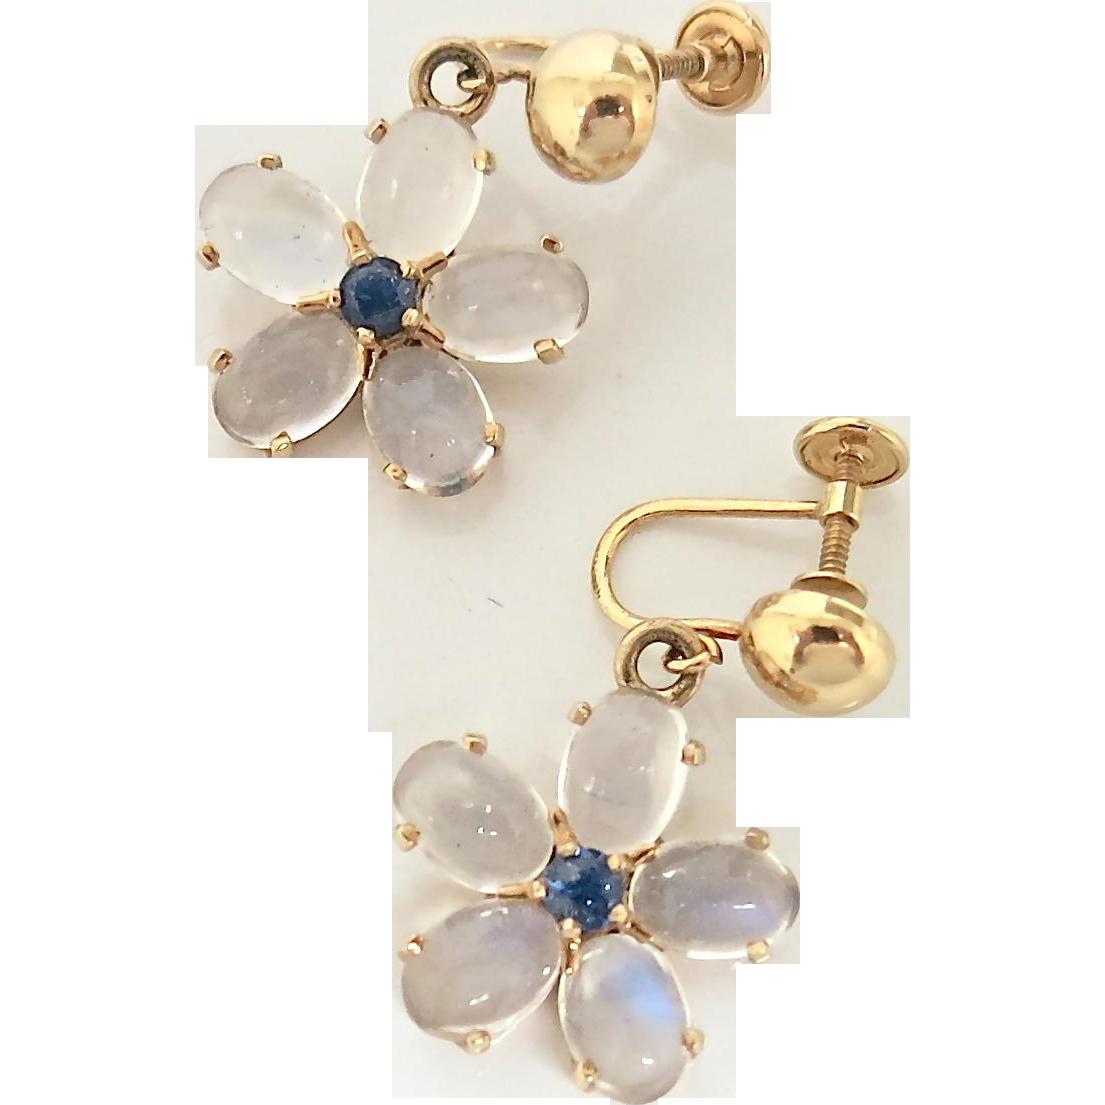 Natural Cabachon Moonstone & Sapphire Earrings